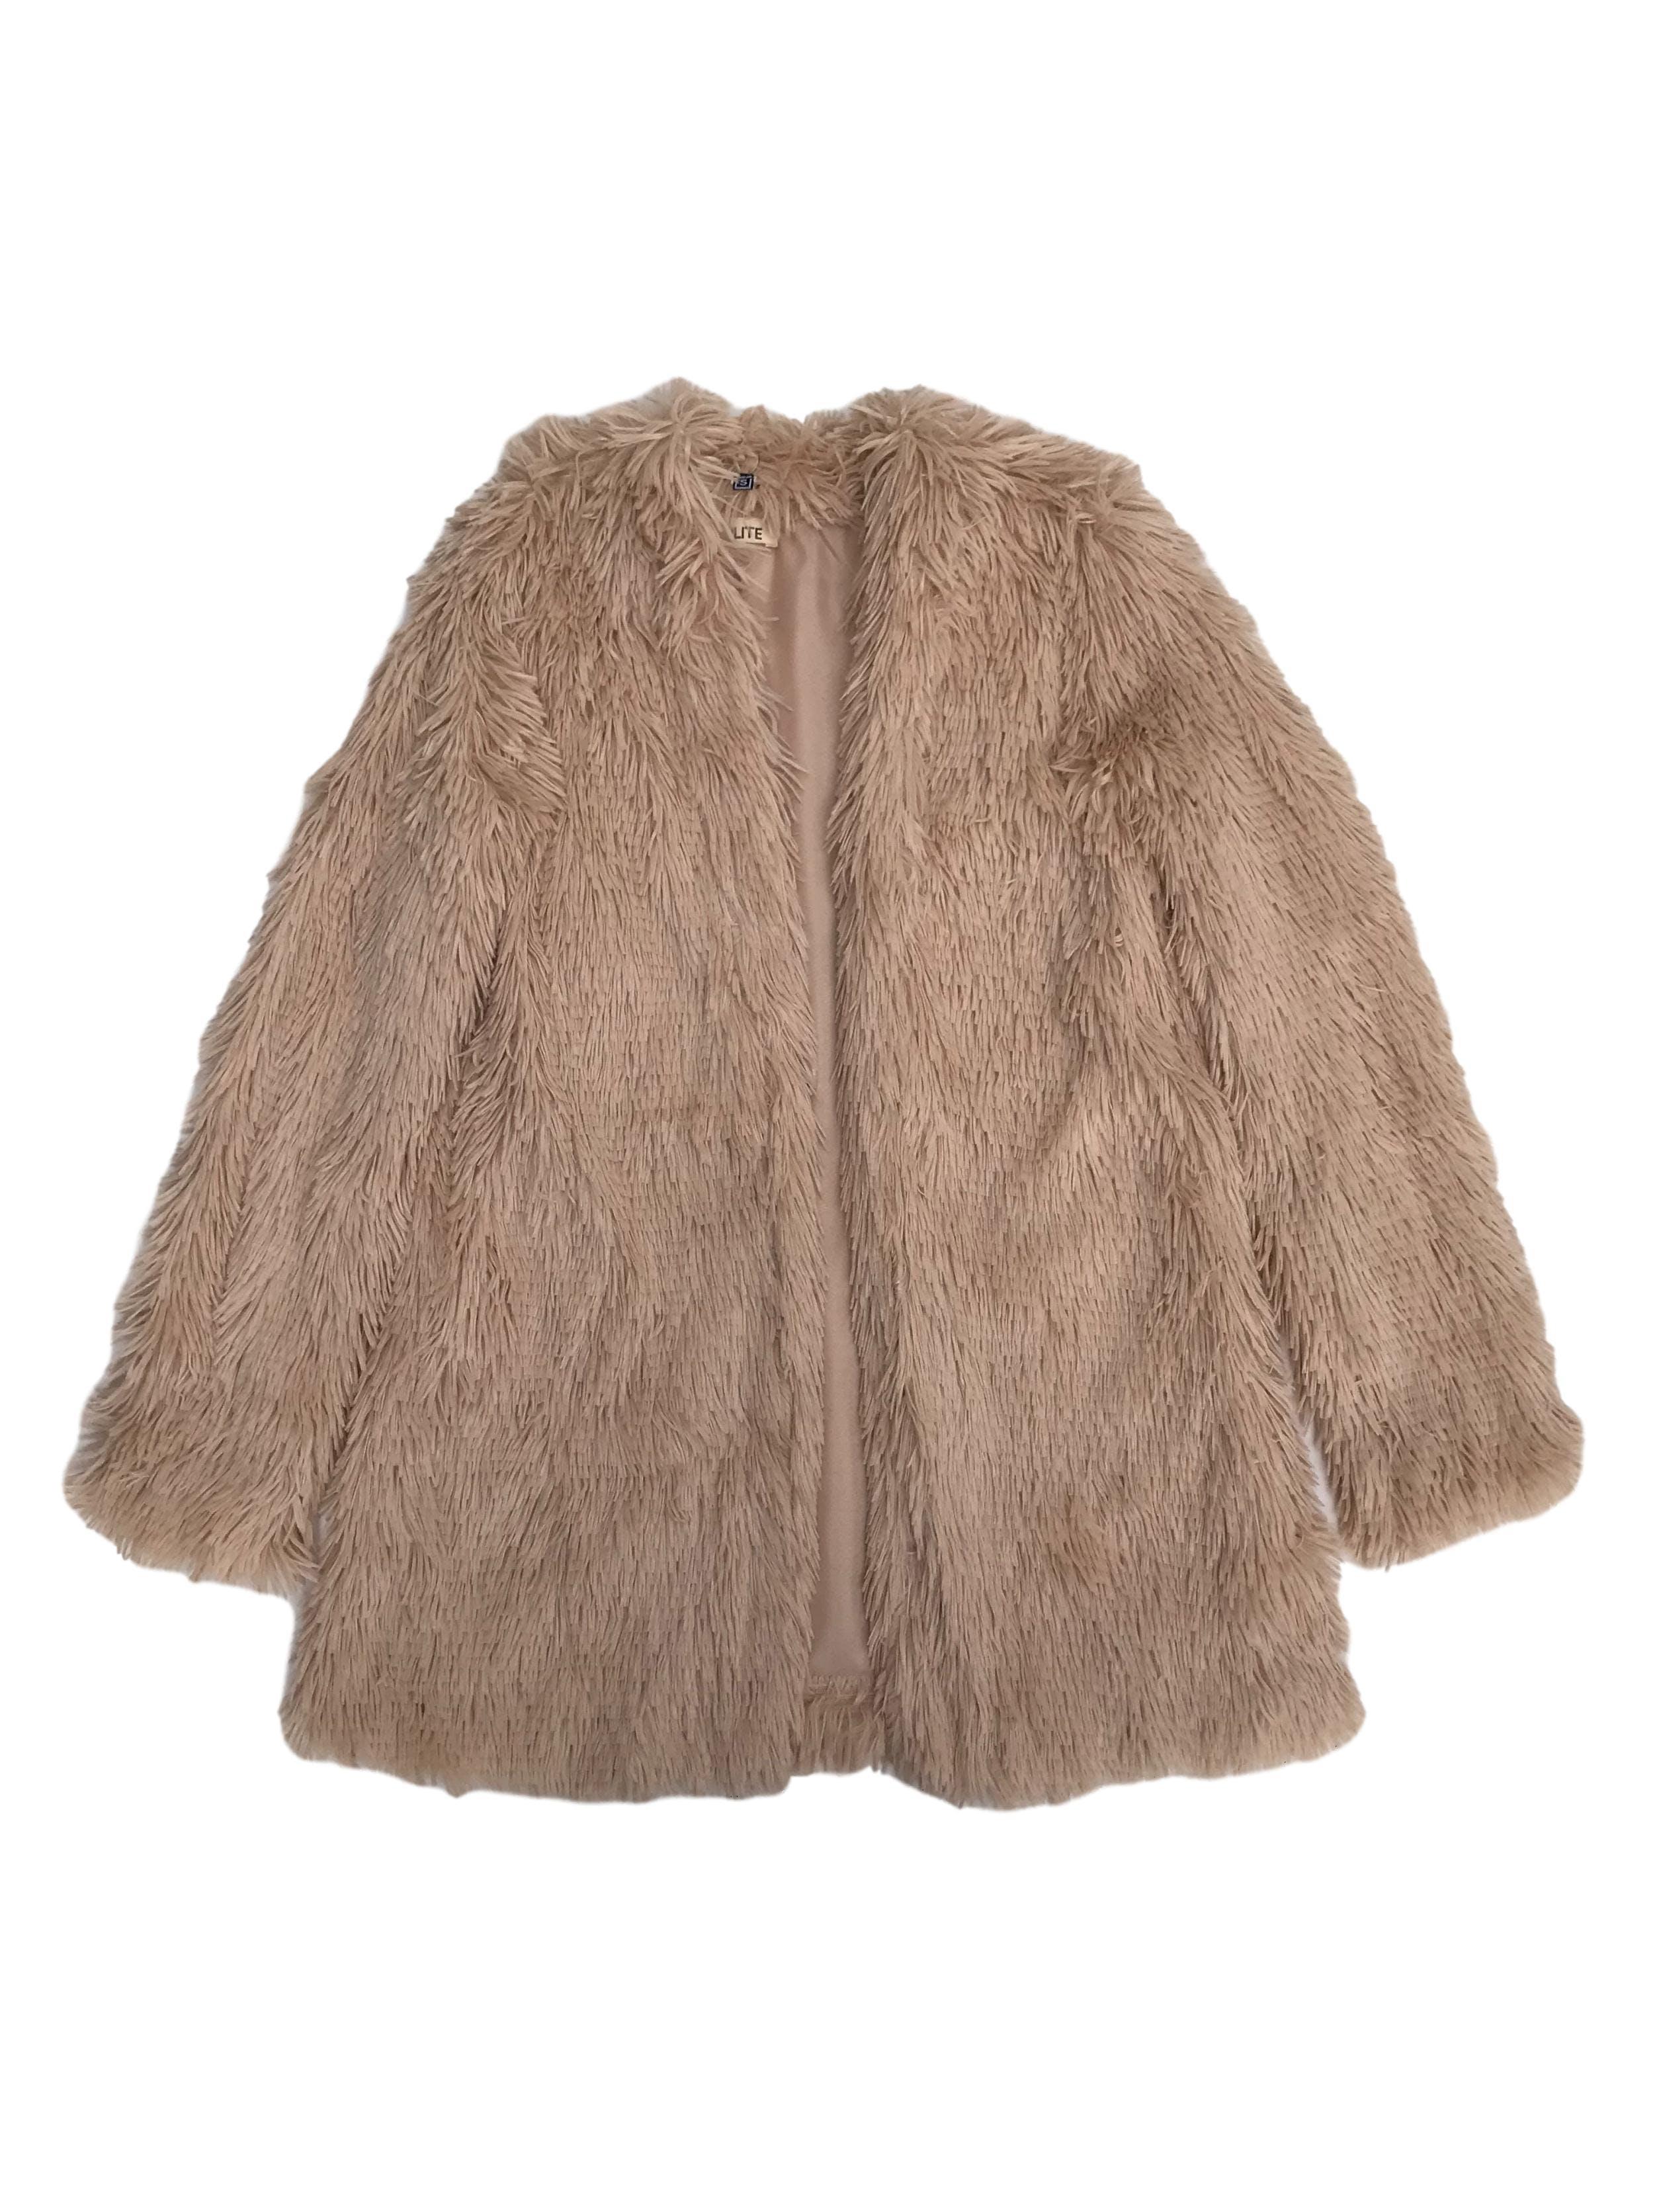 Abrigo abierto de peluche beige, forrada. Super suavecita. Largo 70cm